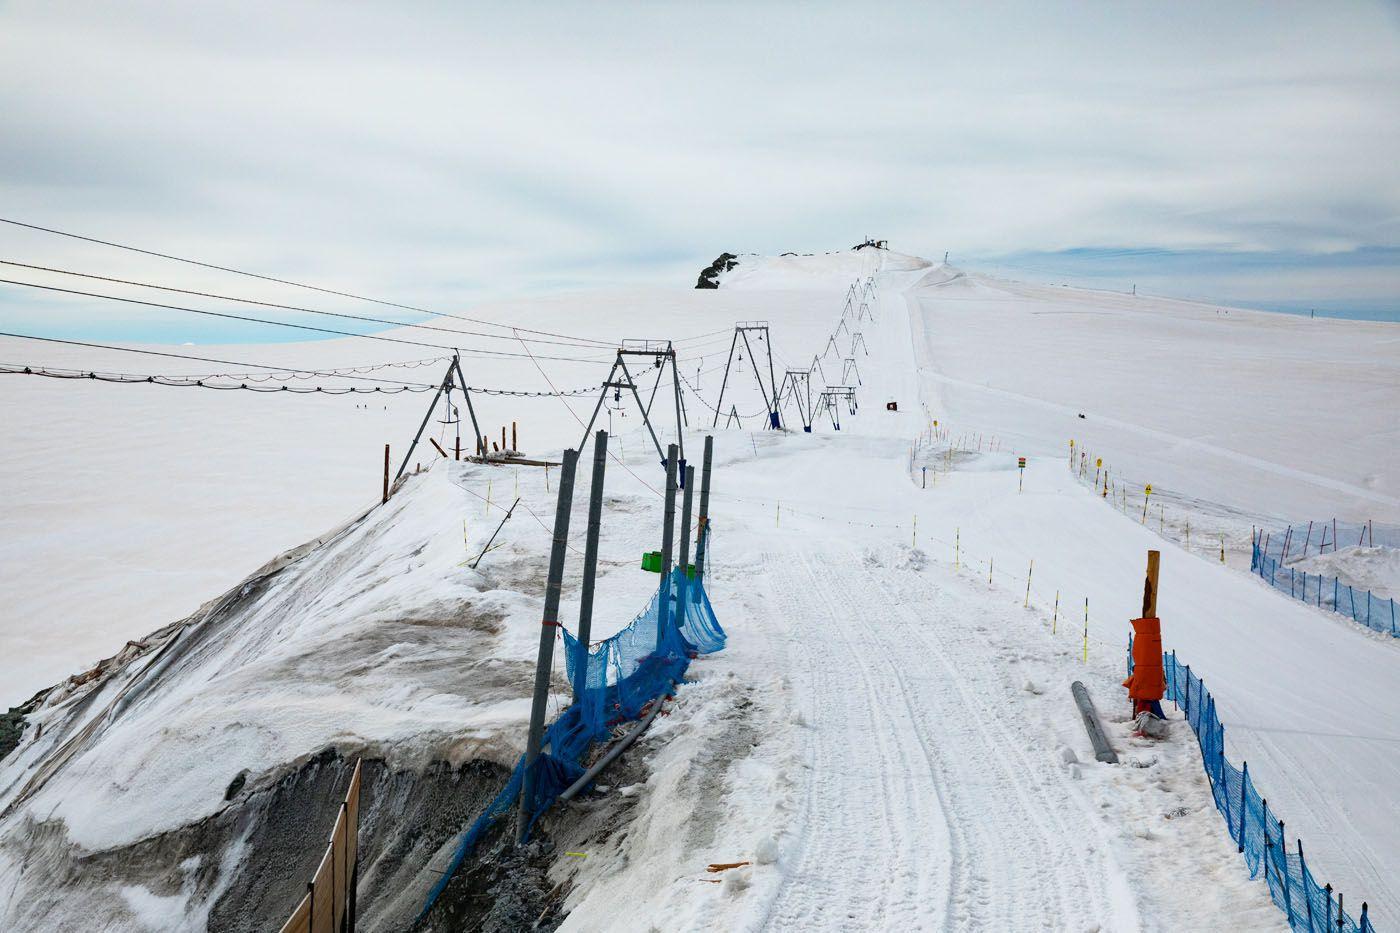 Matterhorn Glacier Paradise Skiing